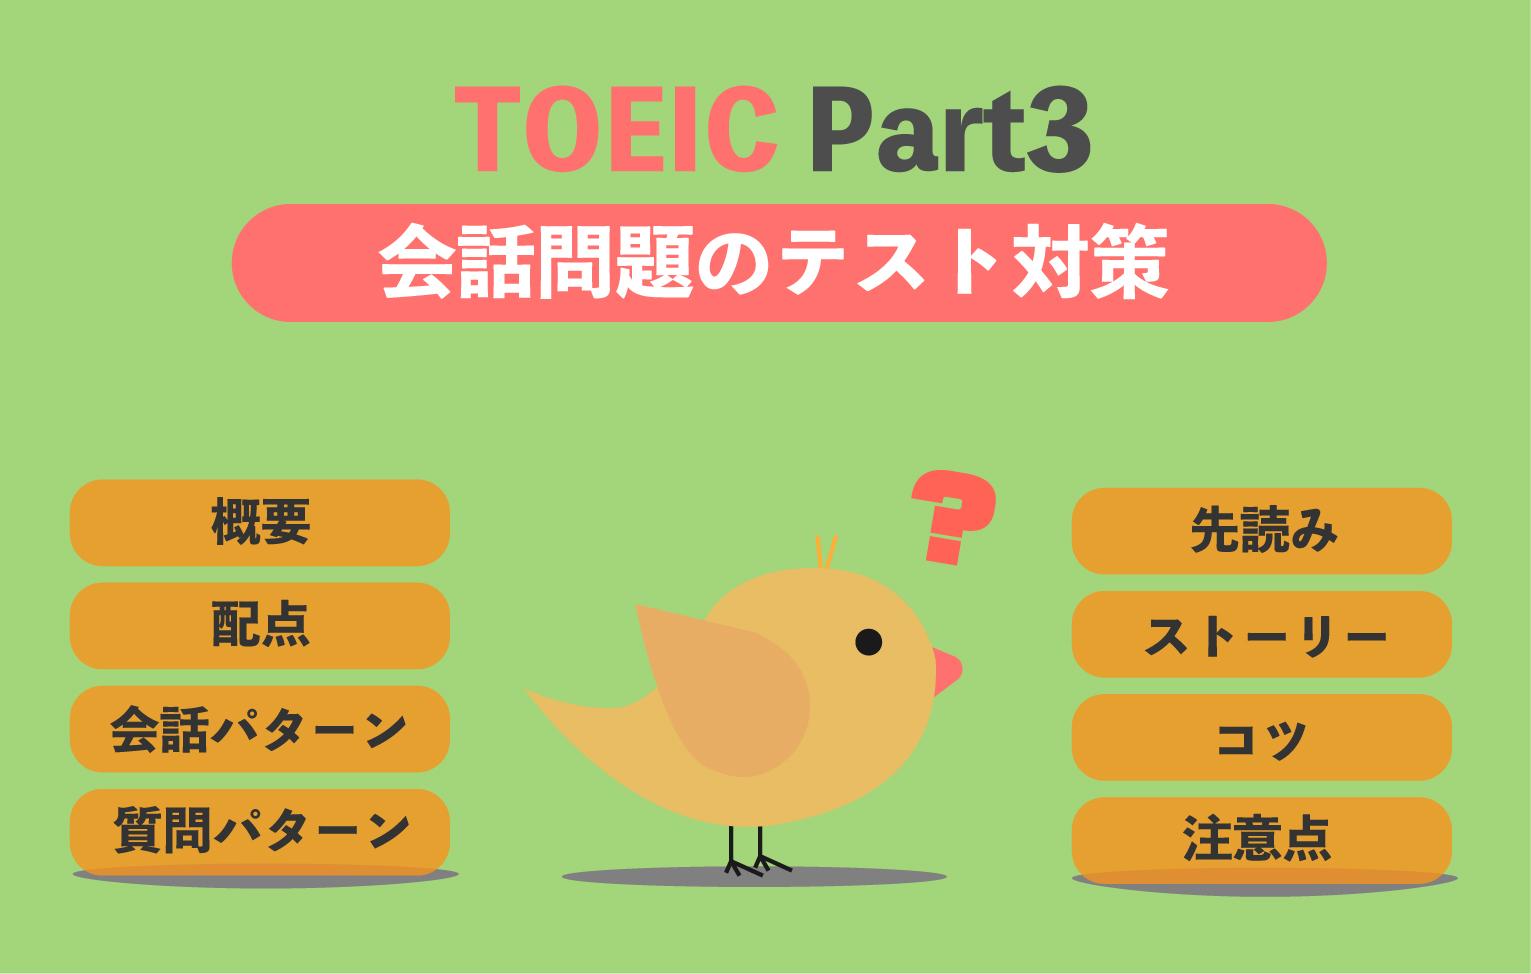 TOEIC Part3 会話問題のテスト対策と解き方のコツ